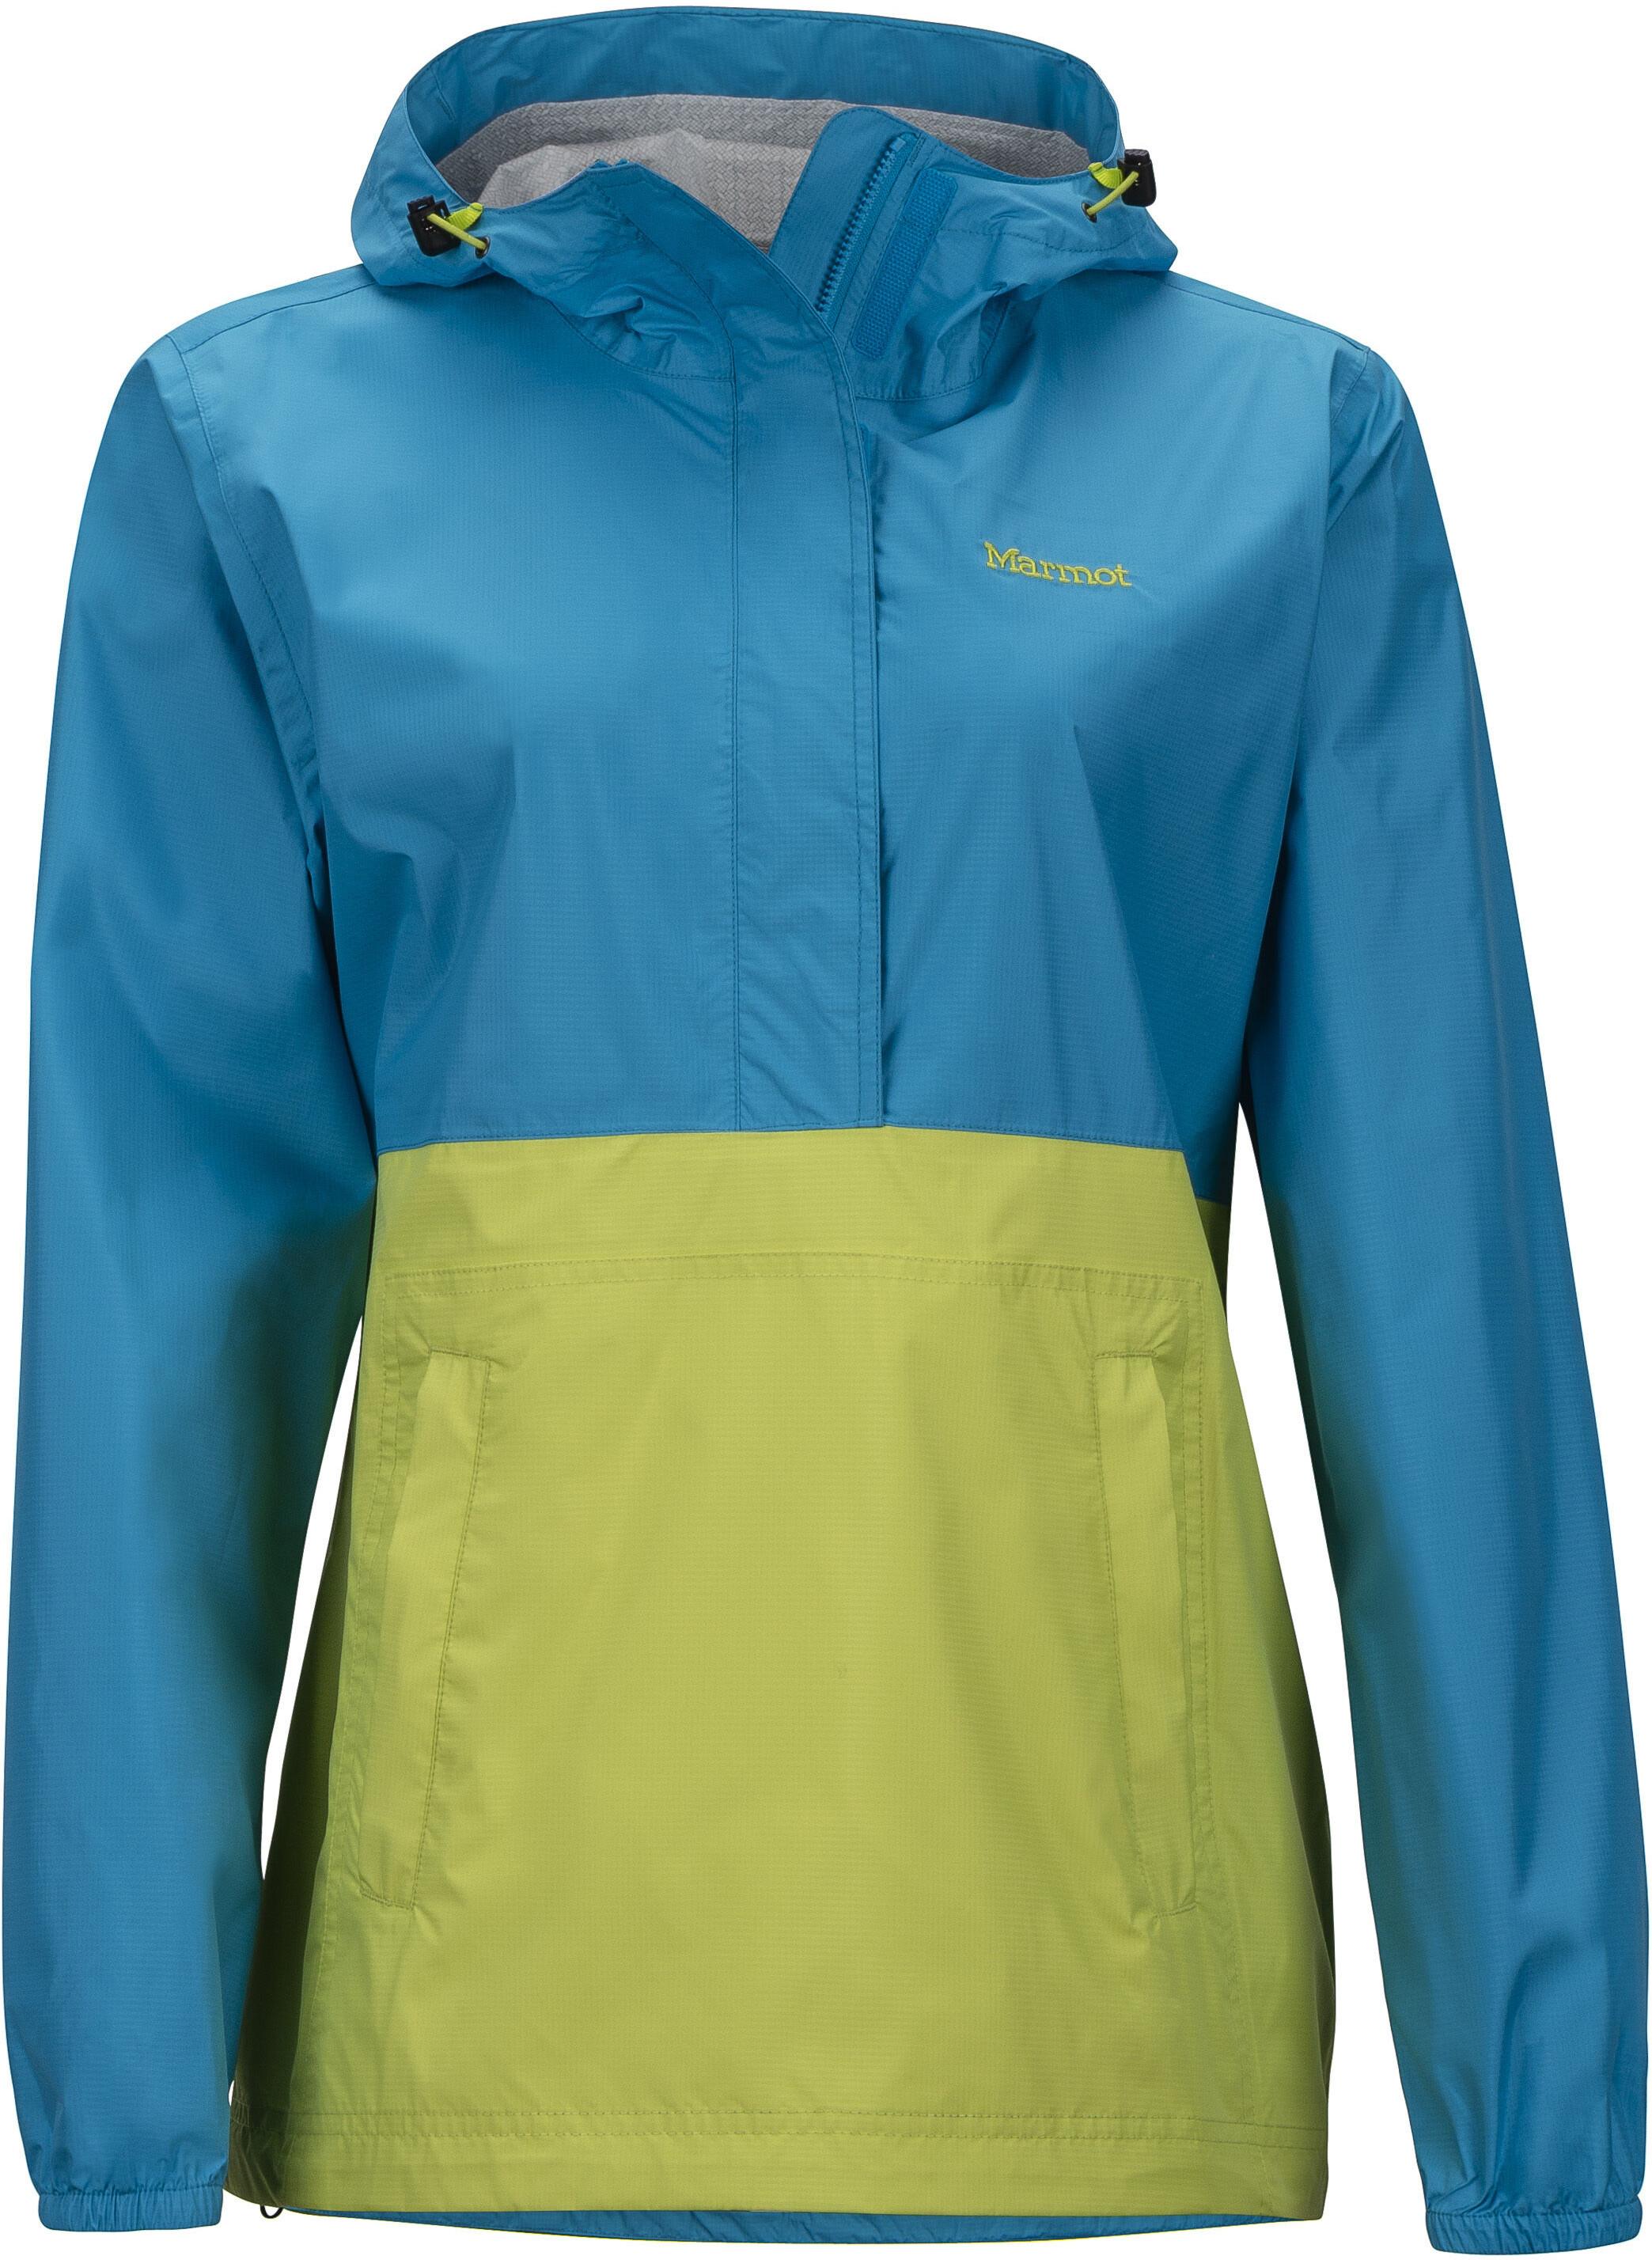 Marmot Women S Alexie Jacket: Marmot PreCip Jacket Women Yellow/blue At Addnature.co.uk